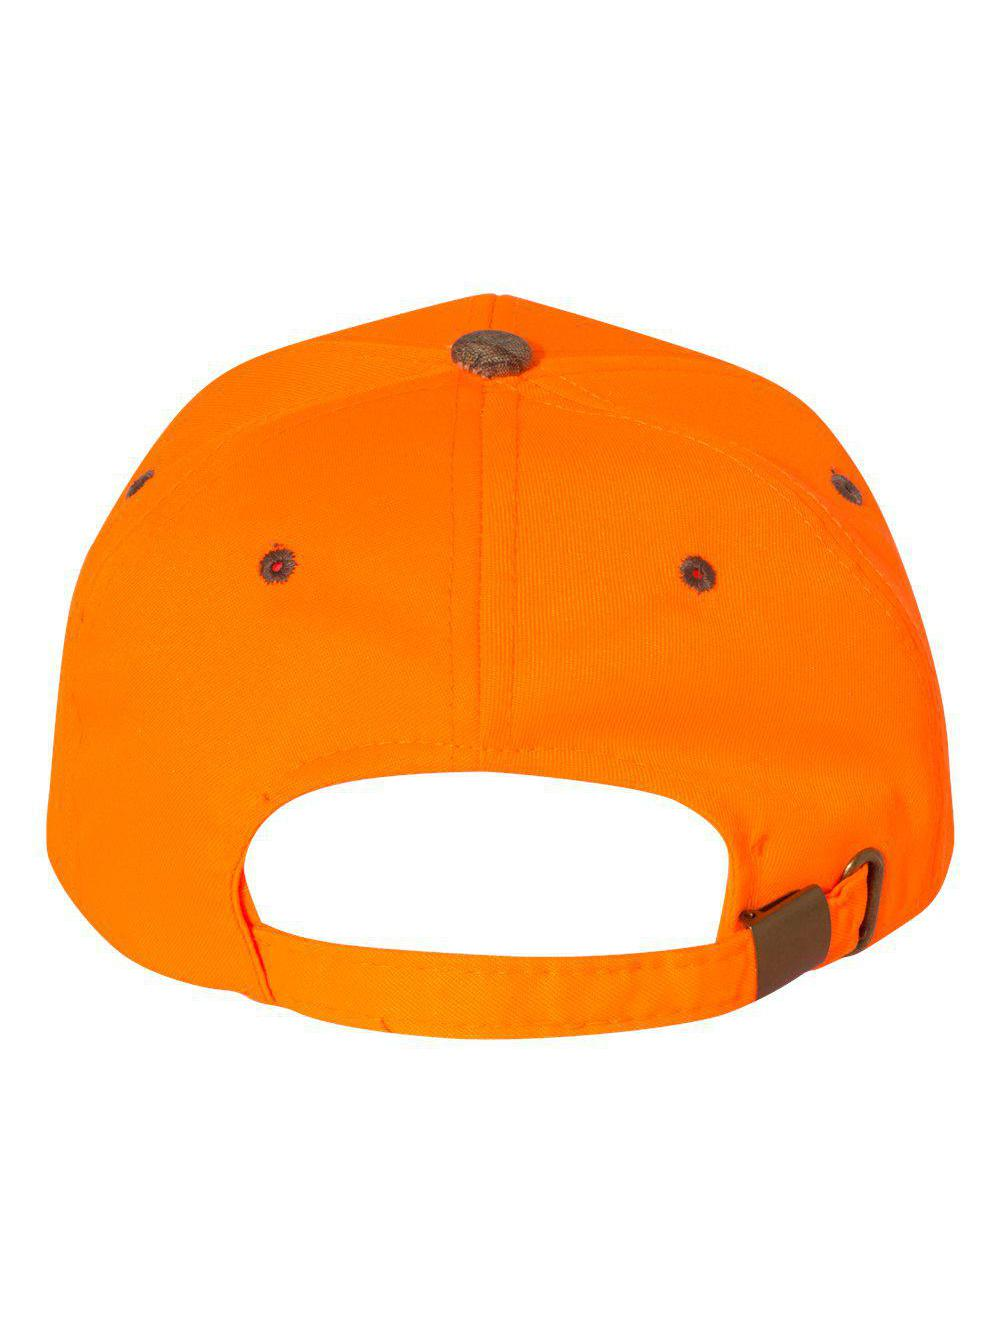 15749793b2b Outdoor-Cap-Blaze-Cap-with-Camo-Visor-202IS thumbnail